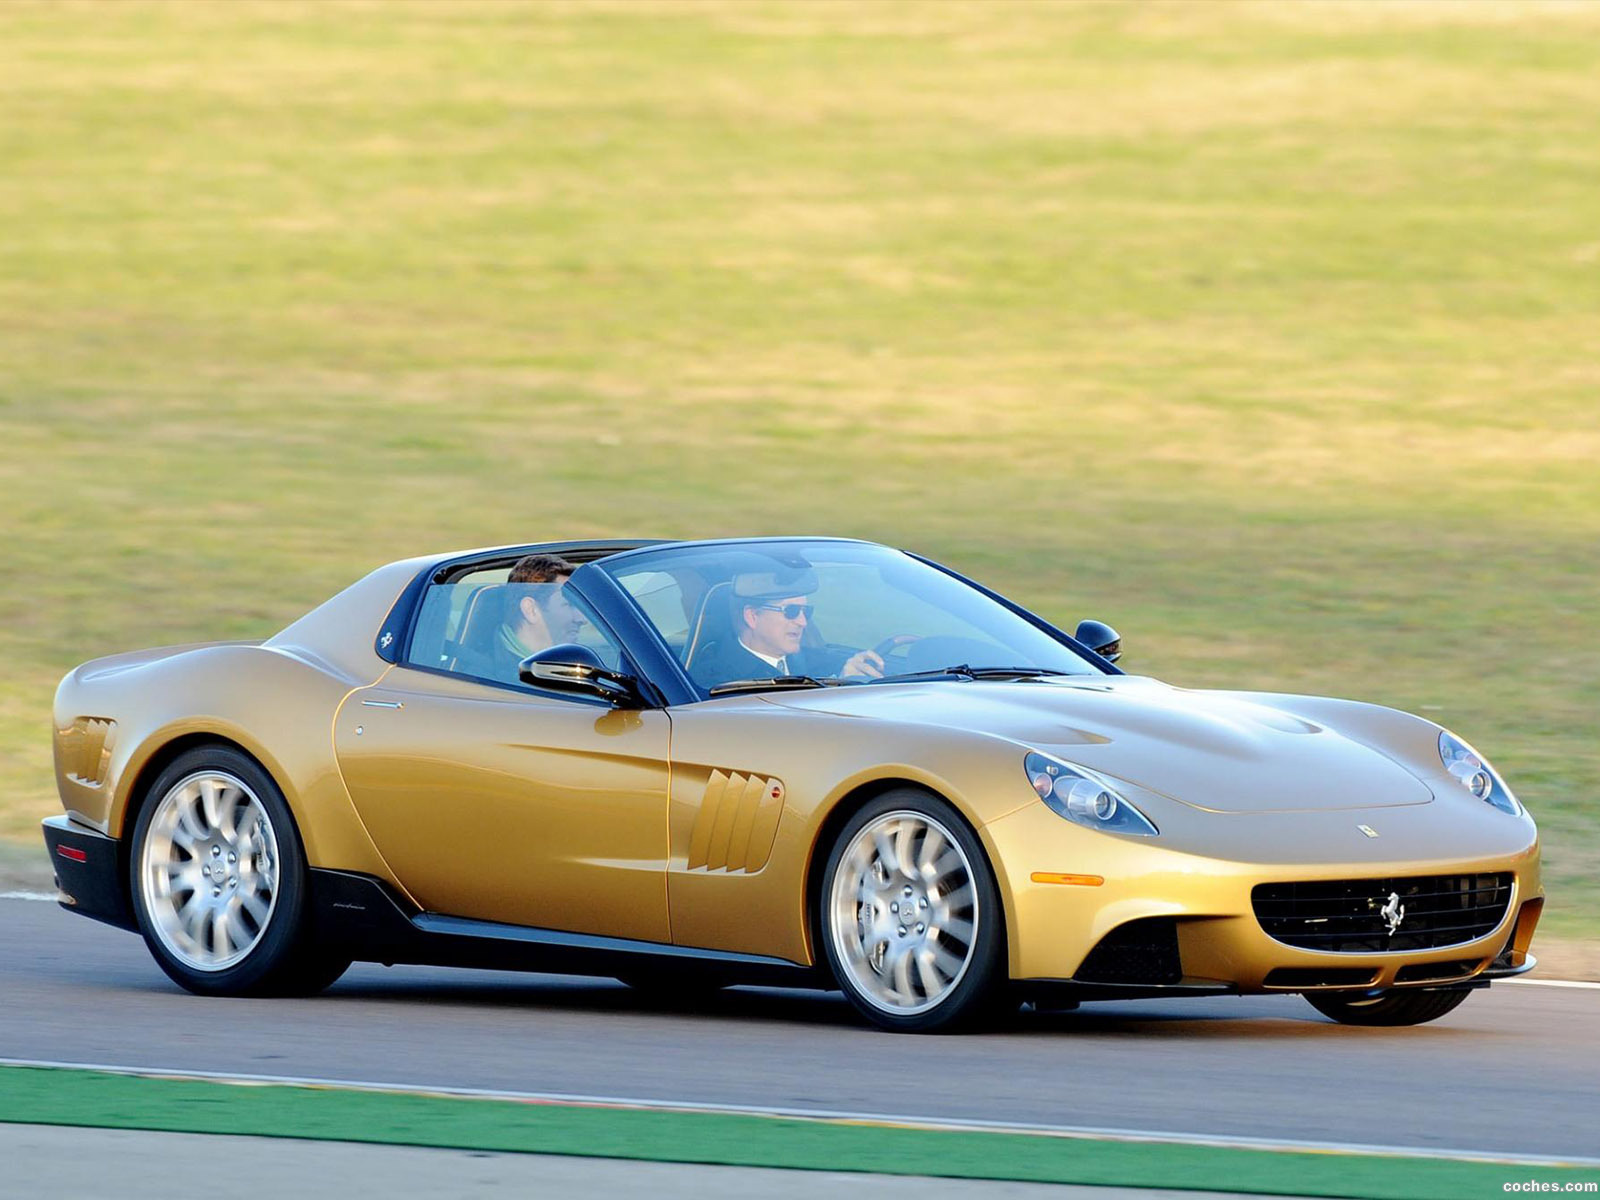 Foto 0 de Ferrari 599 GTB P540 Superfast Aperta 2010